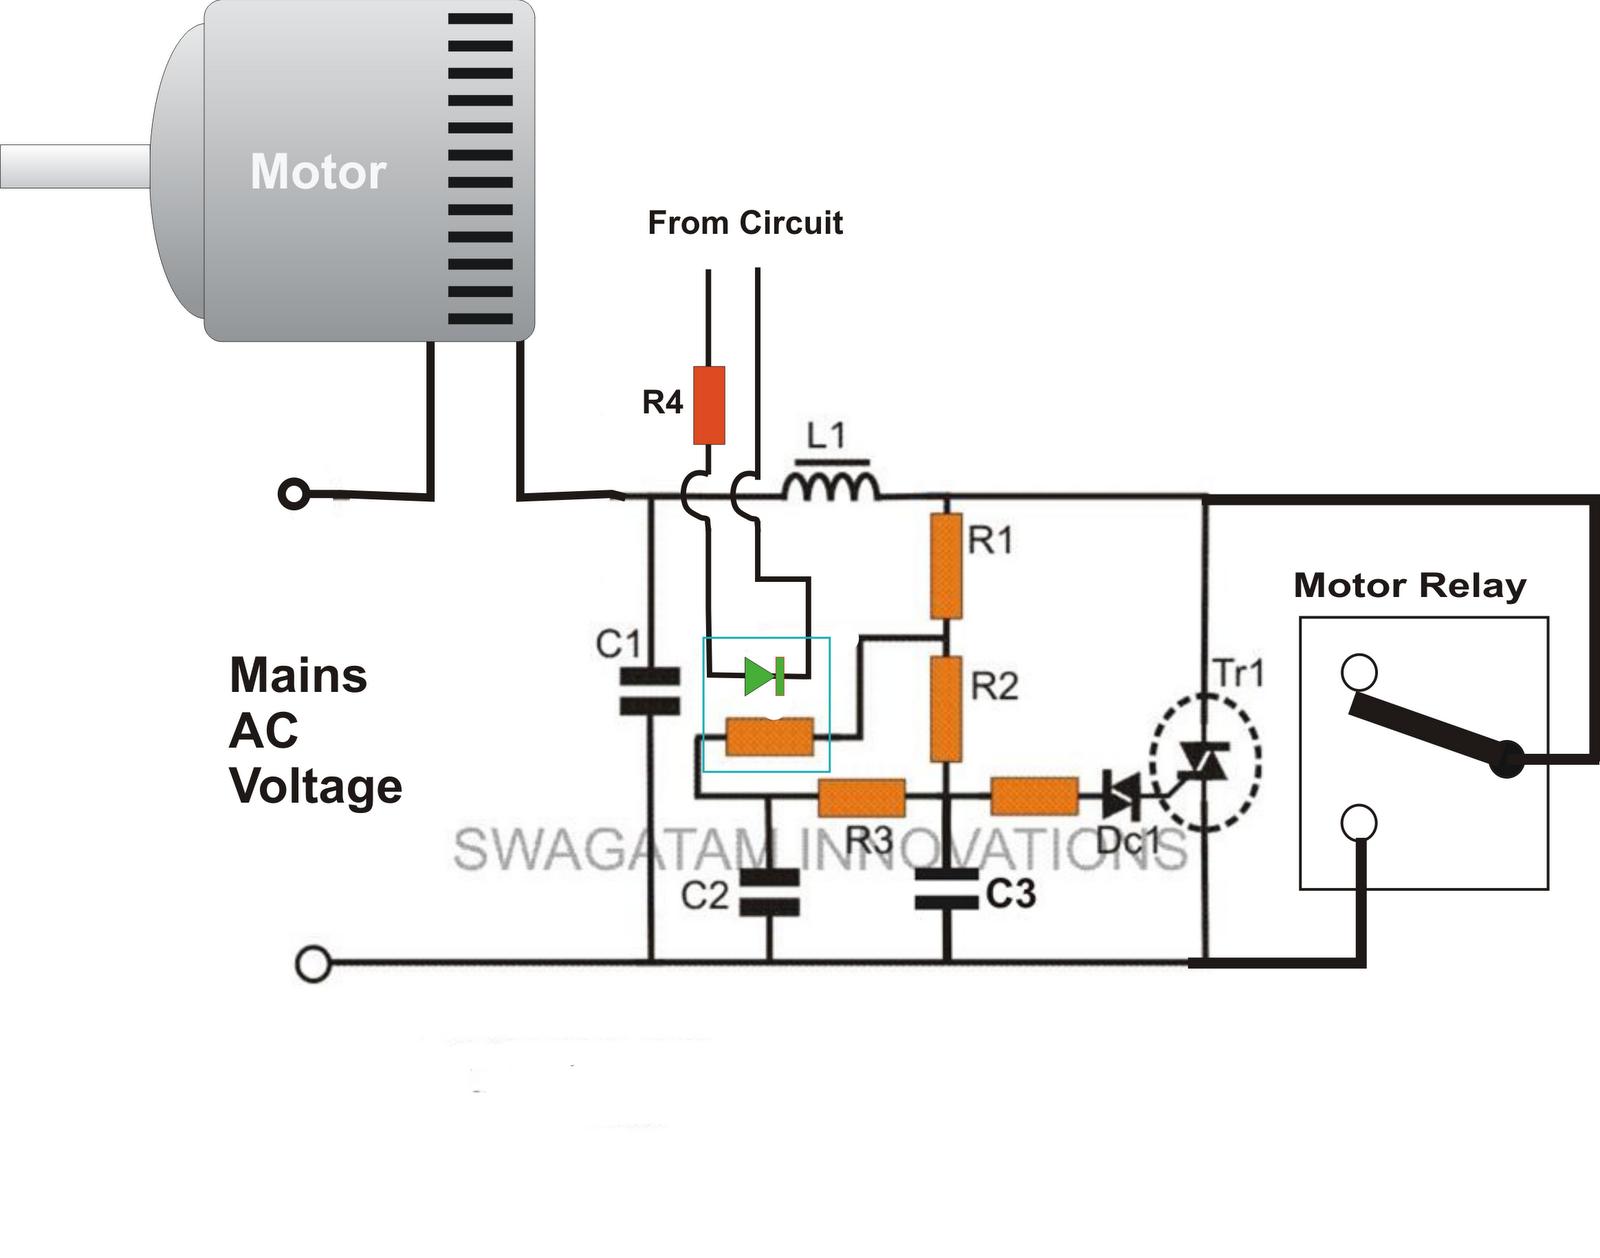 soft start motor starter wiring diagram on 3 phase soft start wiring [ 1600 x 1258 Pixel ]